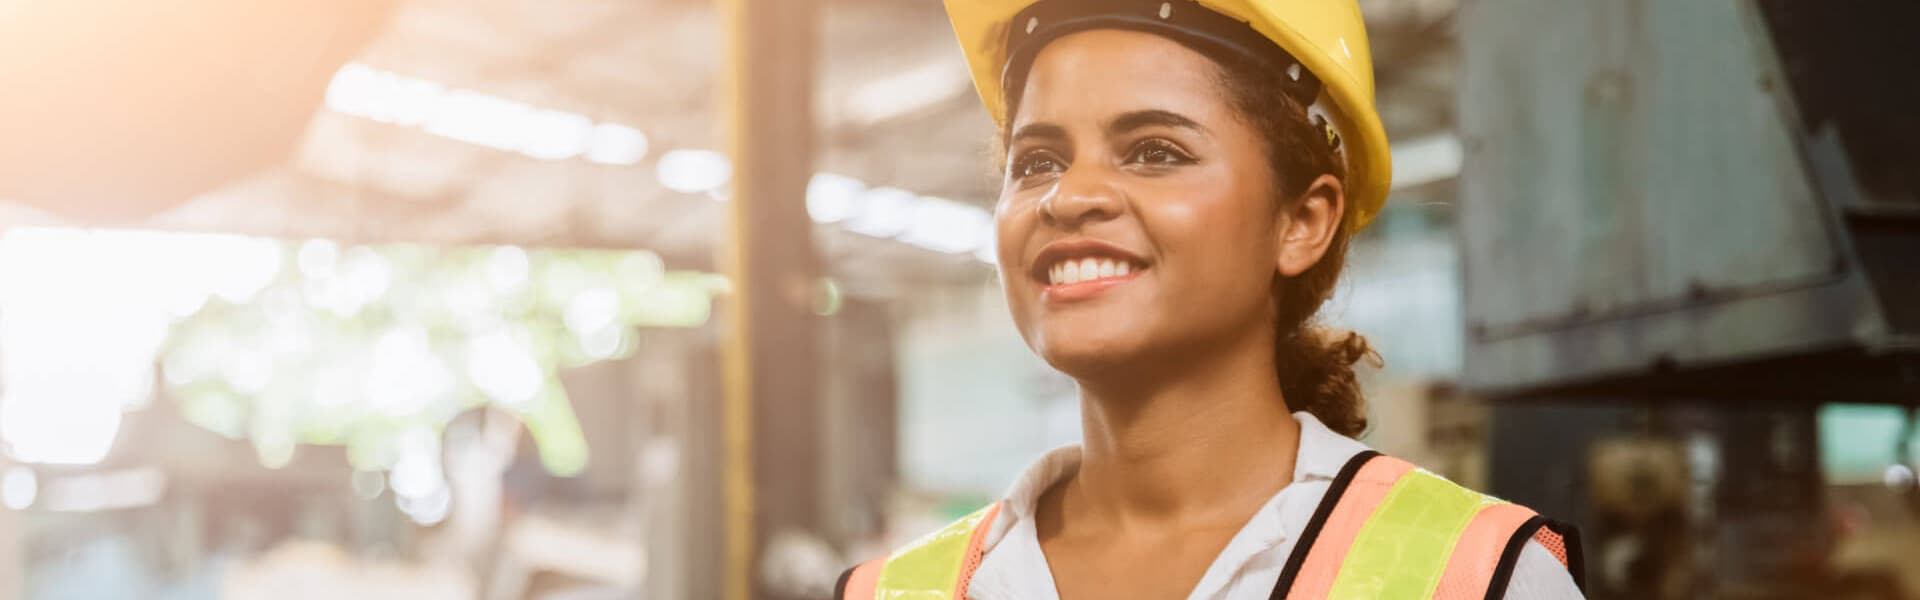 Industry maintenance engineer woman